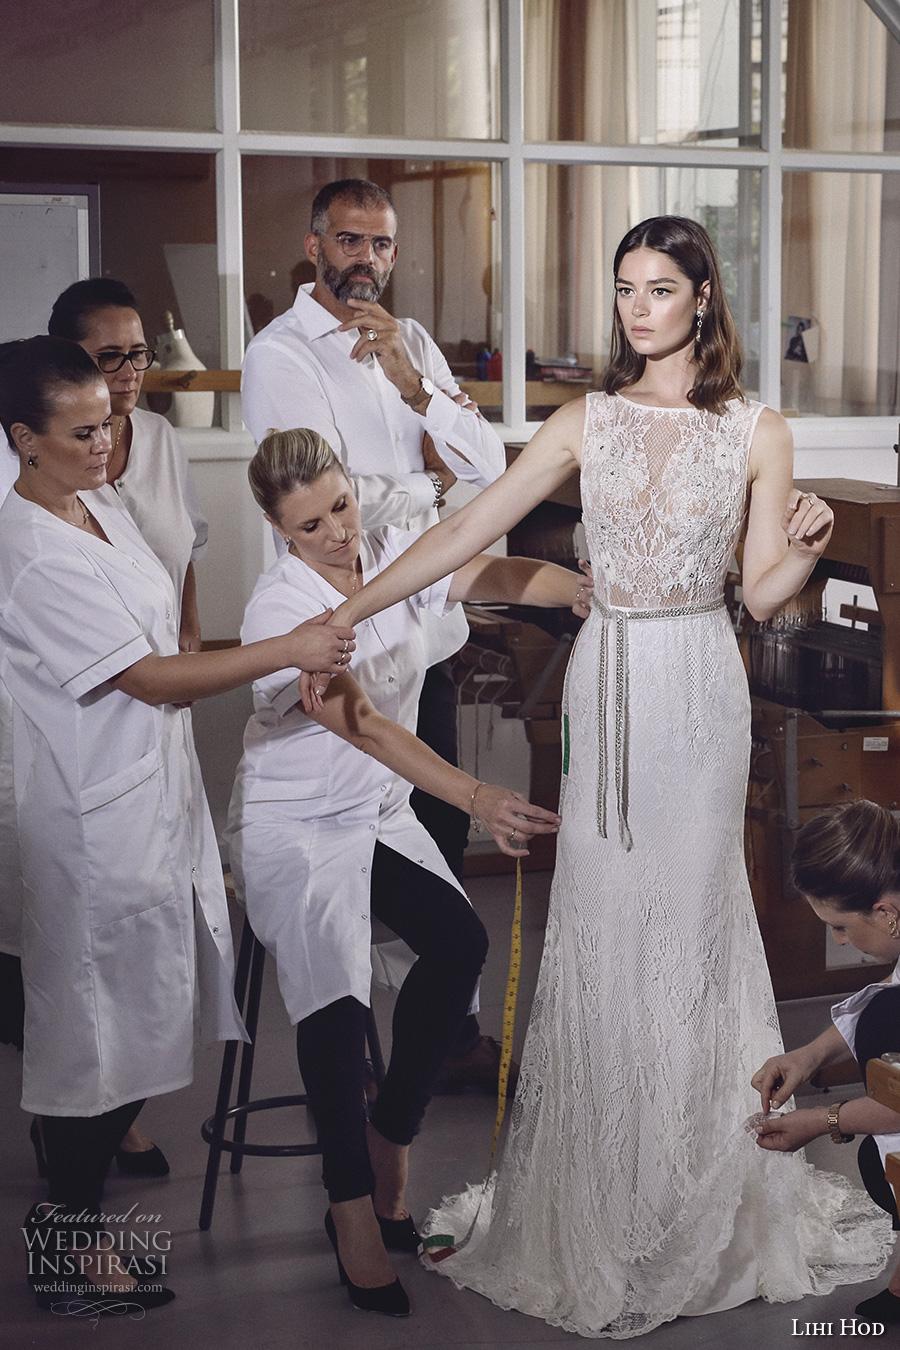 Dhgate Wedding Dress 67 Cool lihi hod bridal sleeveless